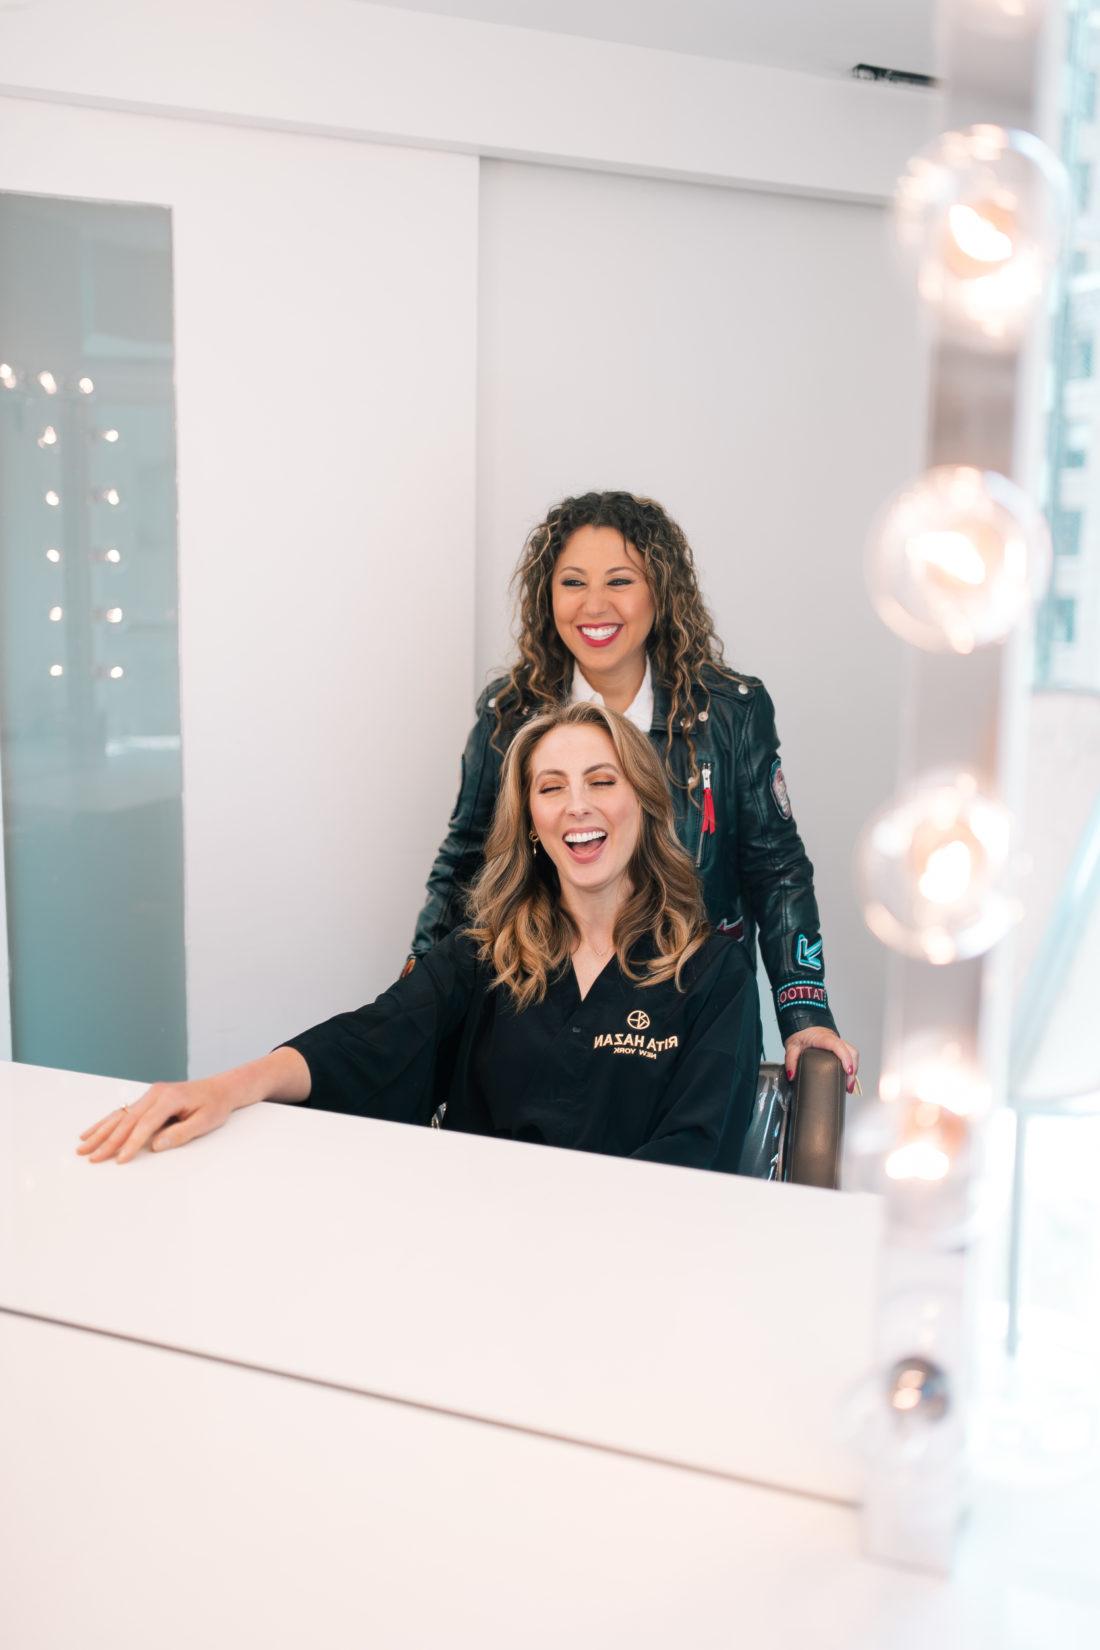 Rita Hazan plays with client Eva Amurri Martino's hair at her salon in New York City